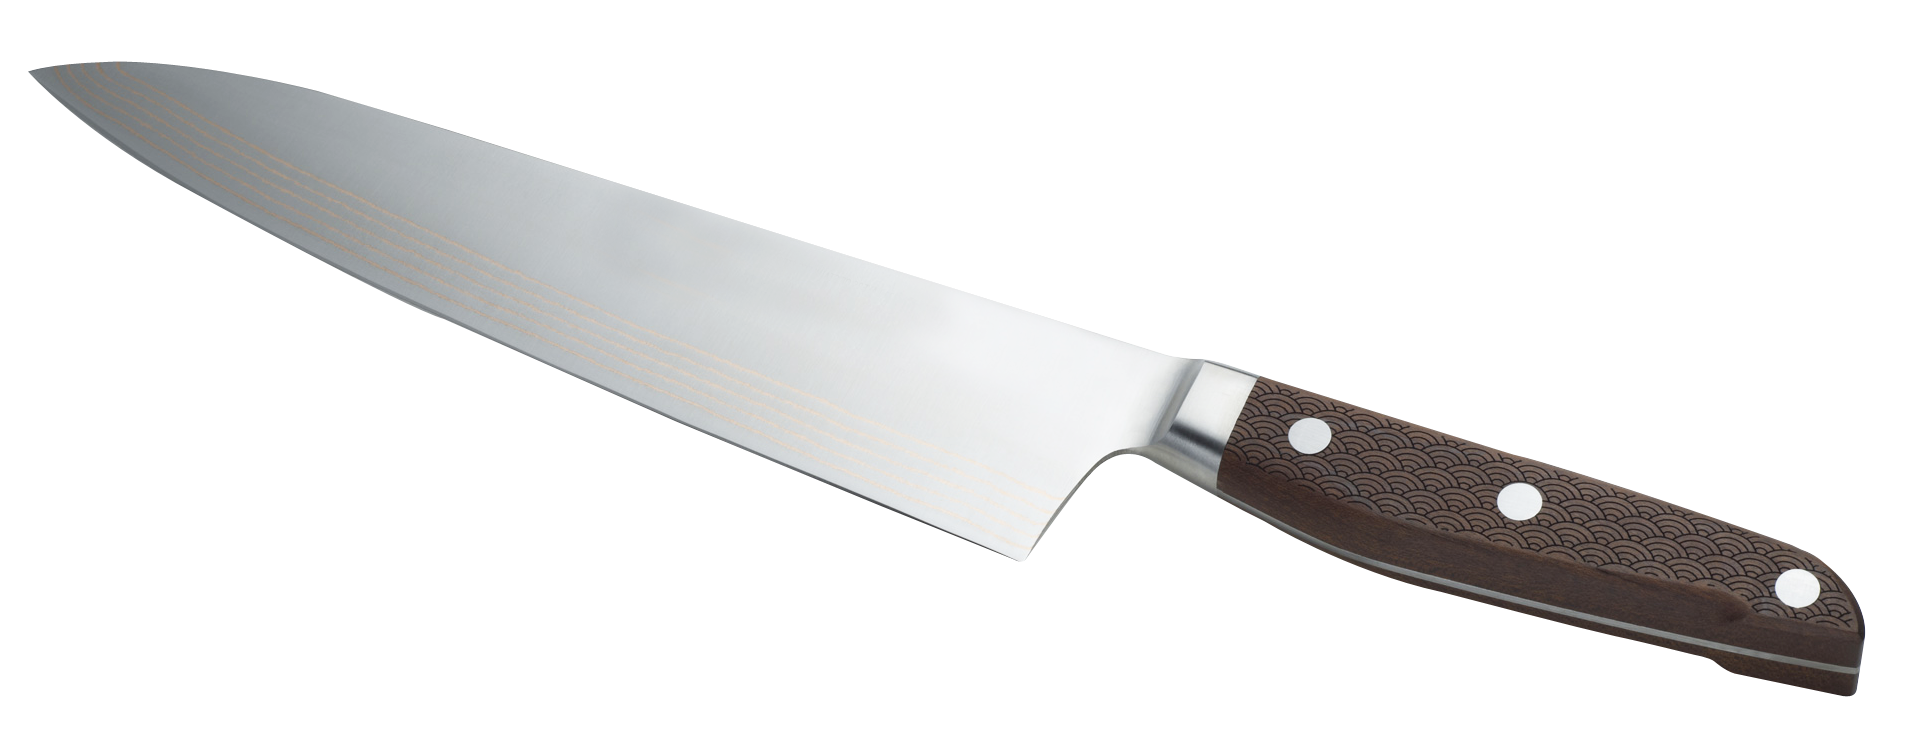 Knife clipart fancy. Hq png transparent images